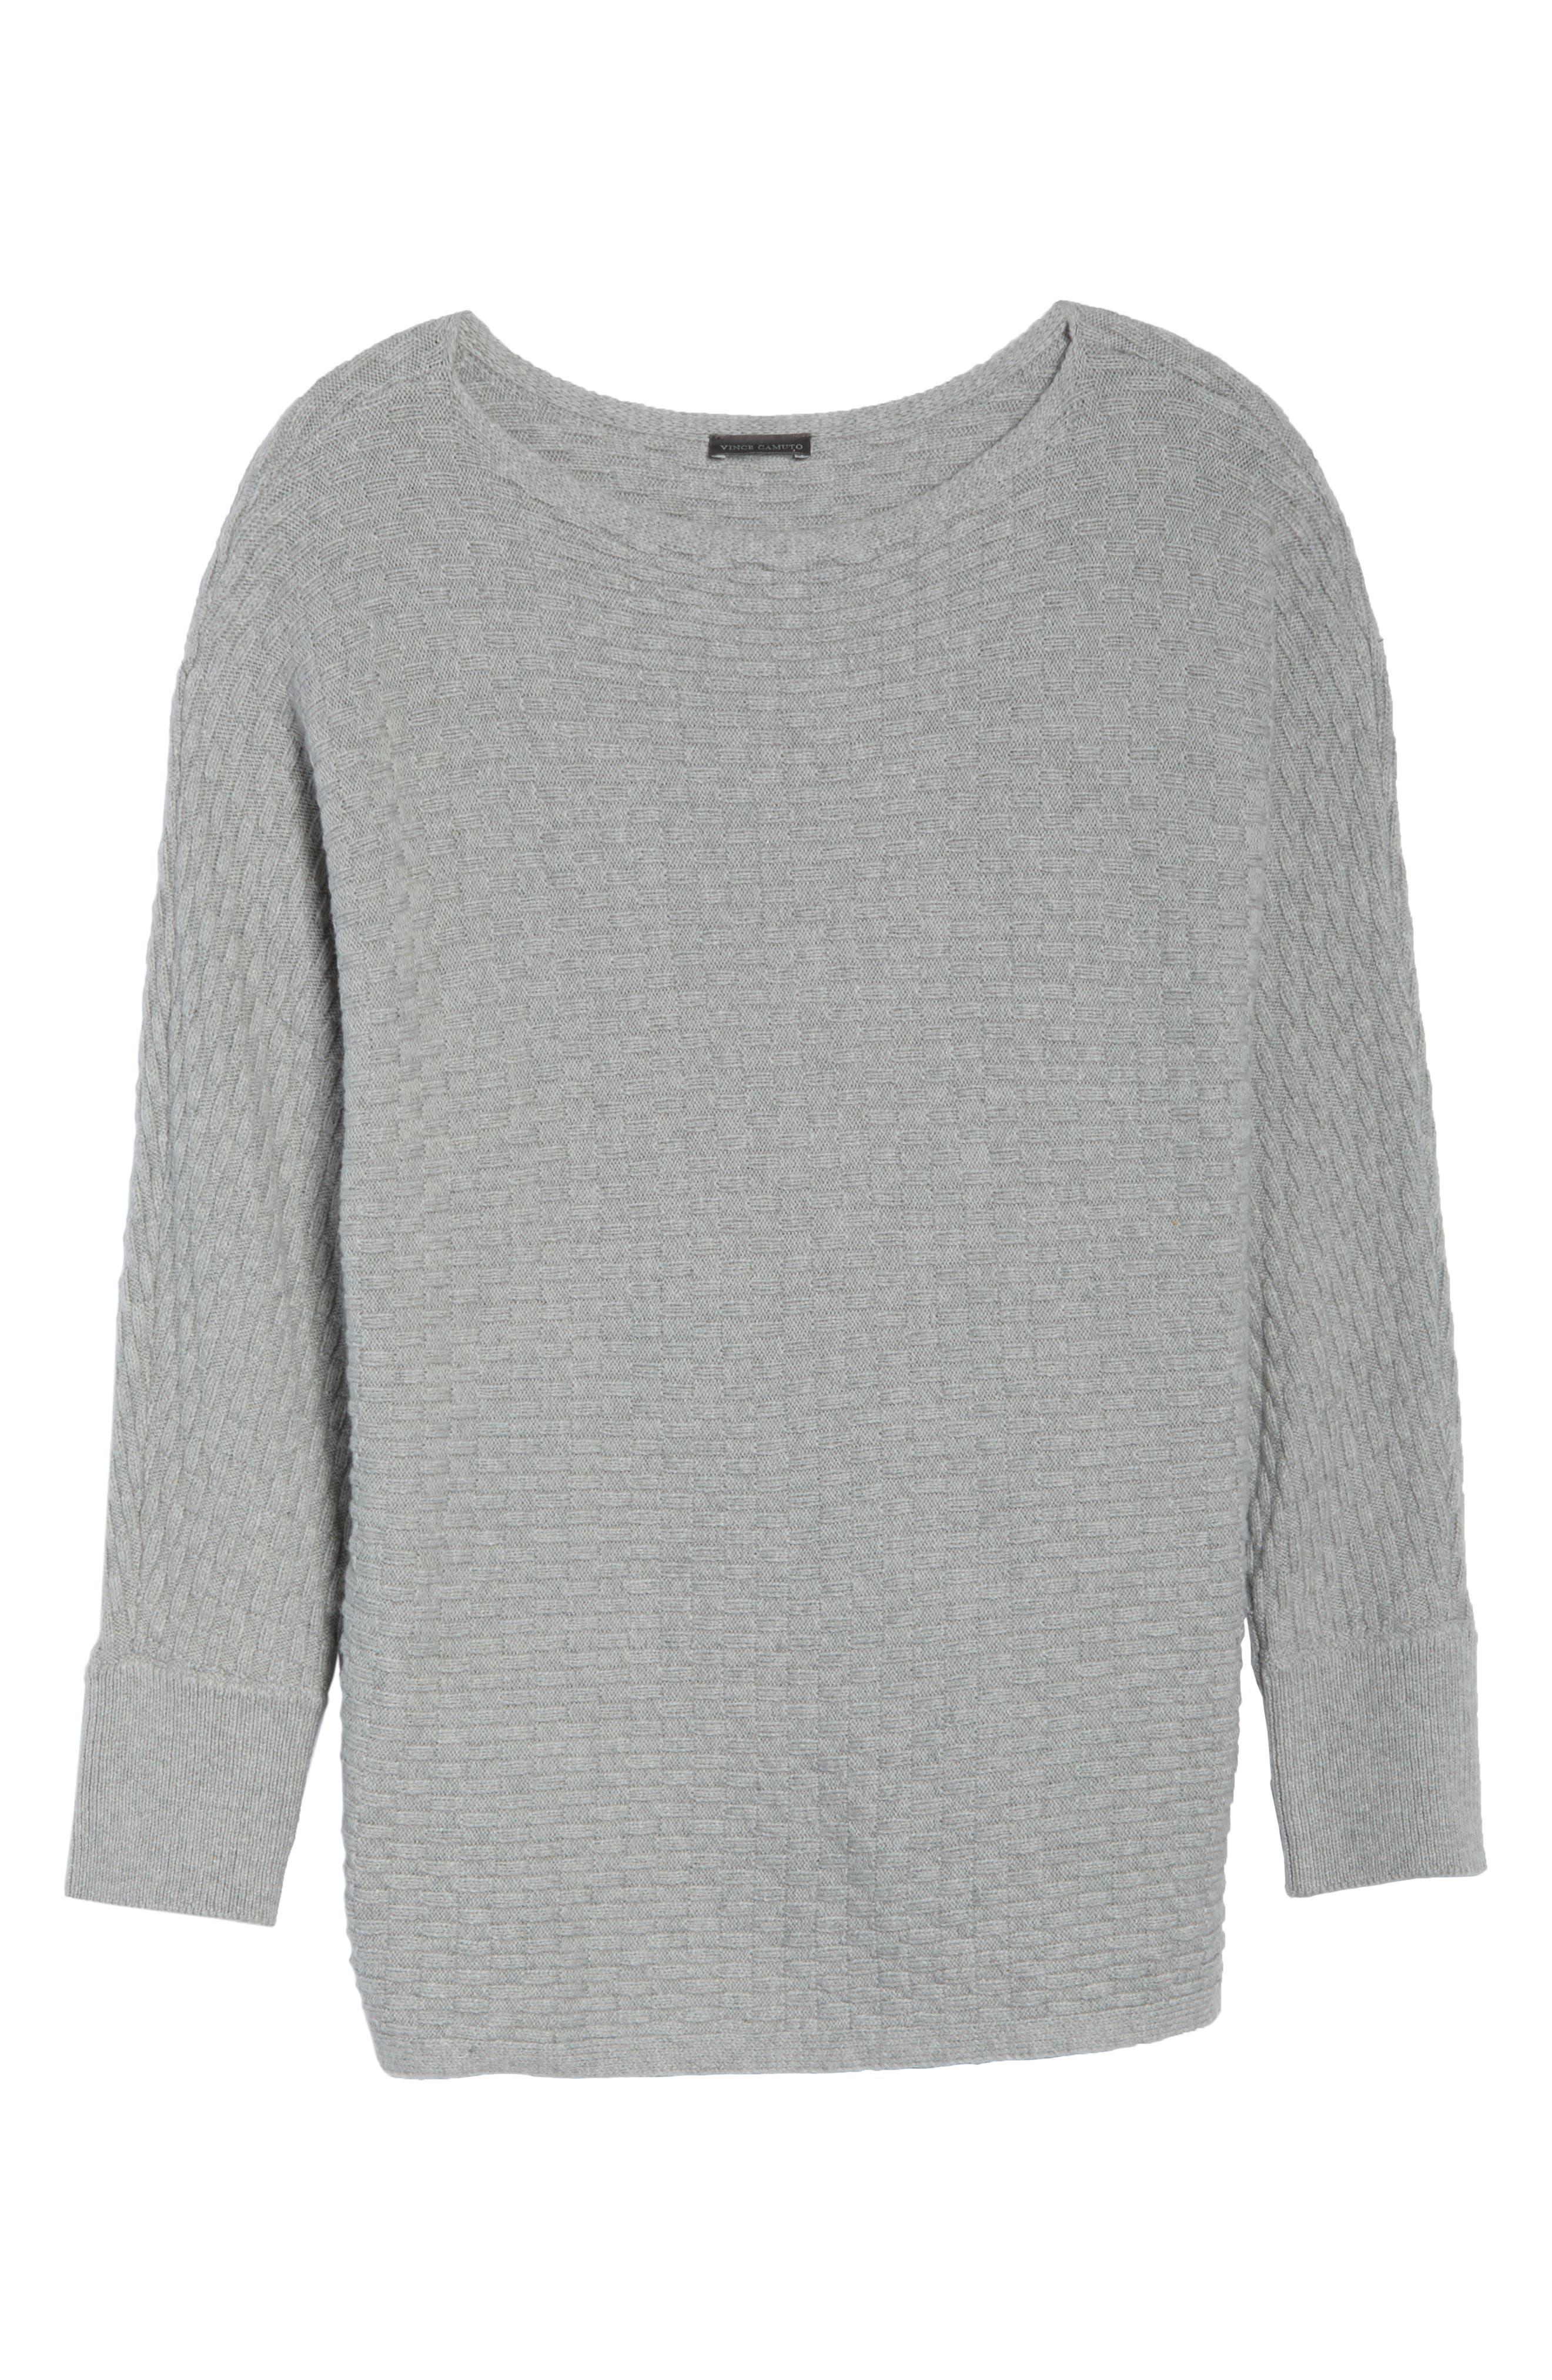 Boatneck Sweater,                             Alternate thumbnail 6, color,                             LIGHT HEATHER GREY